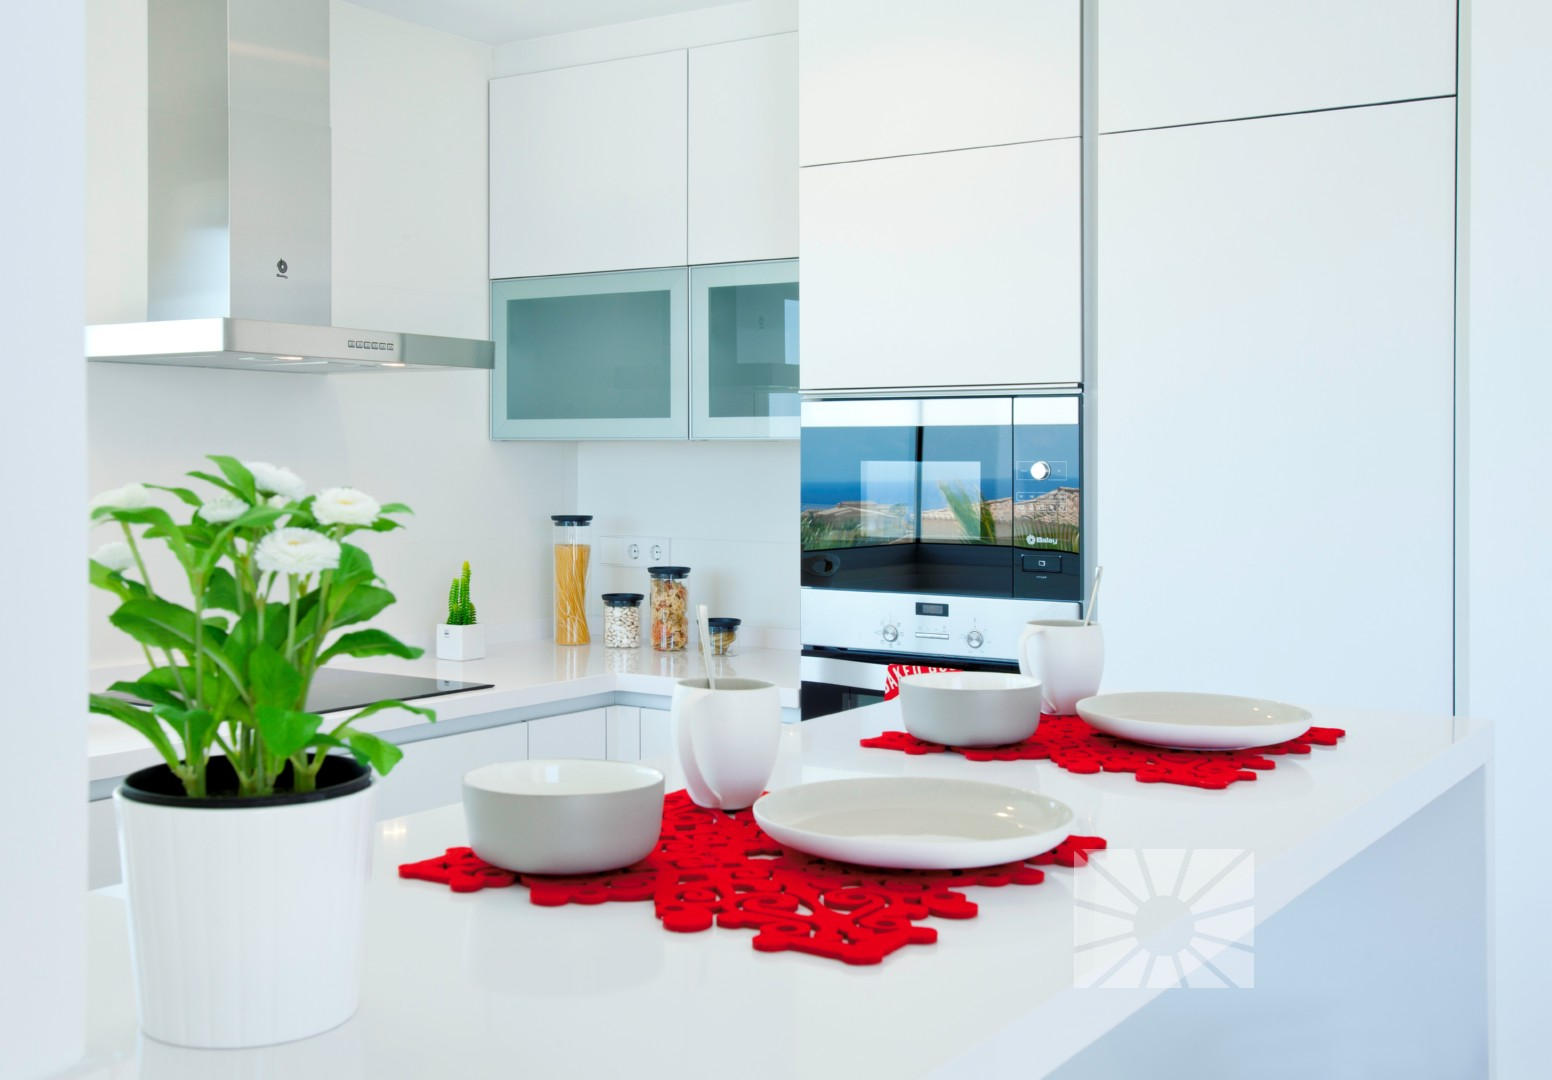 Lirios Design Cumbre del Sol Moderne Villa Zum verkauf ref: AL113 ...